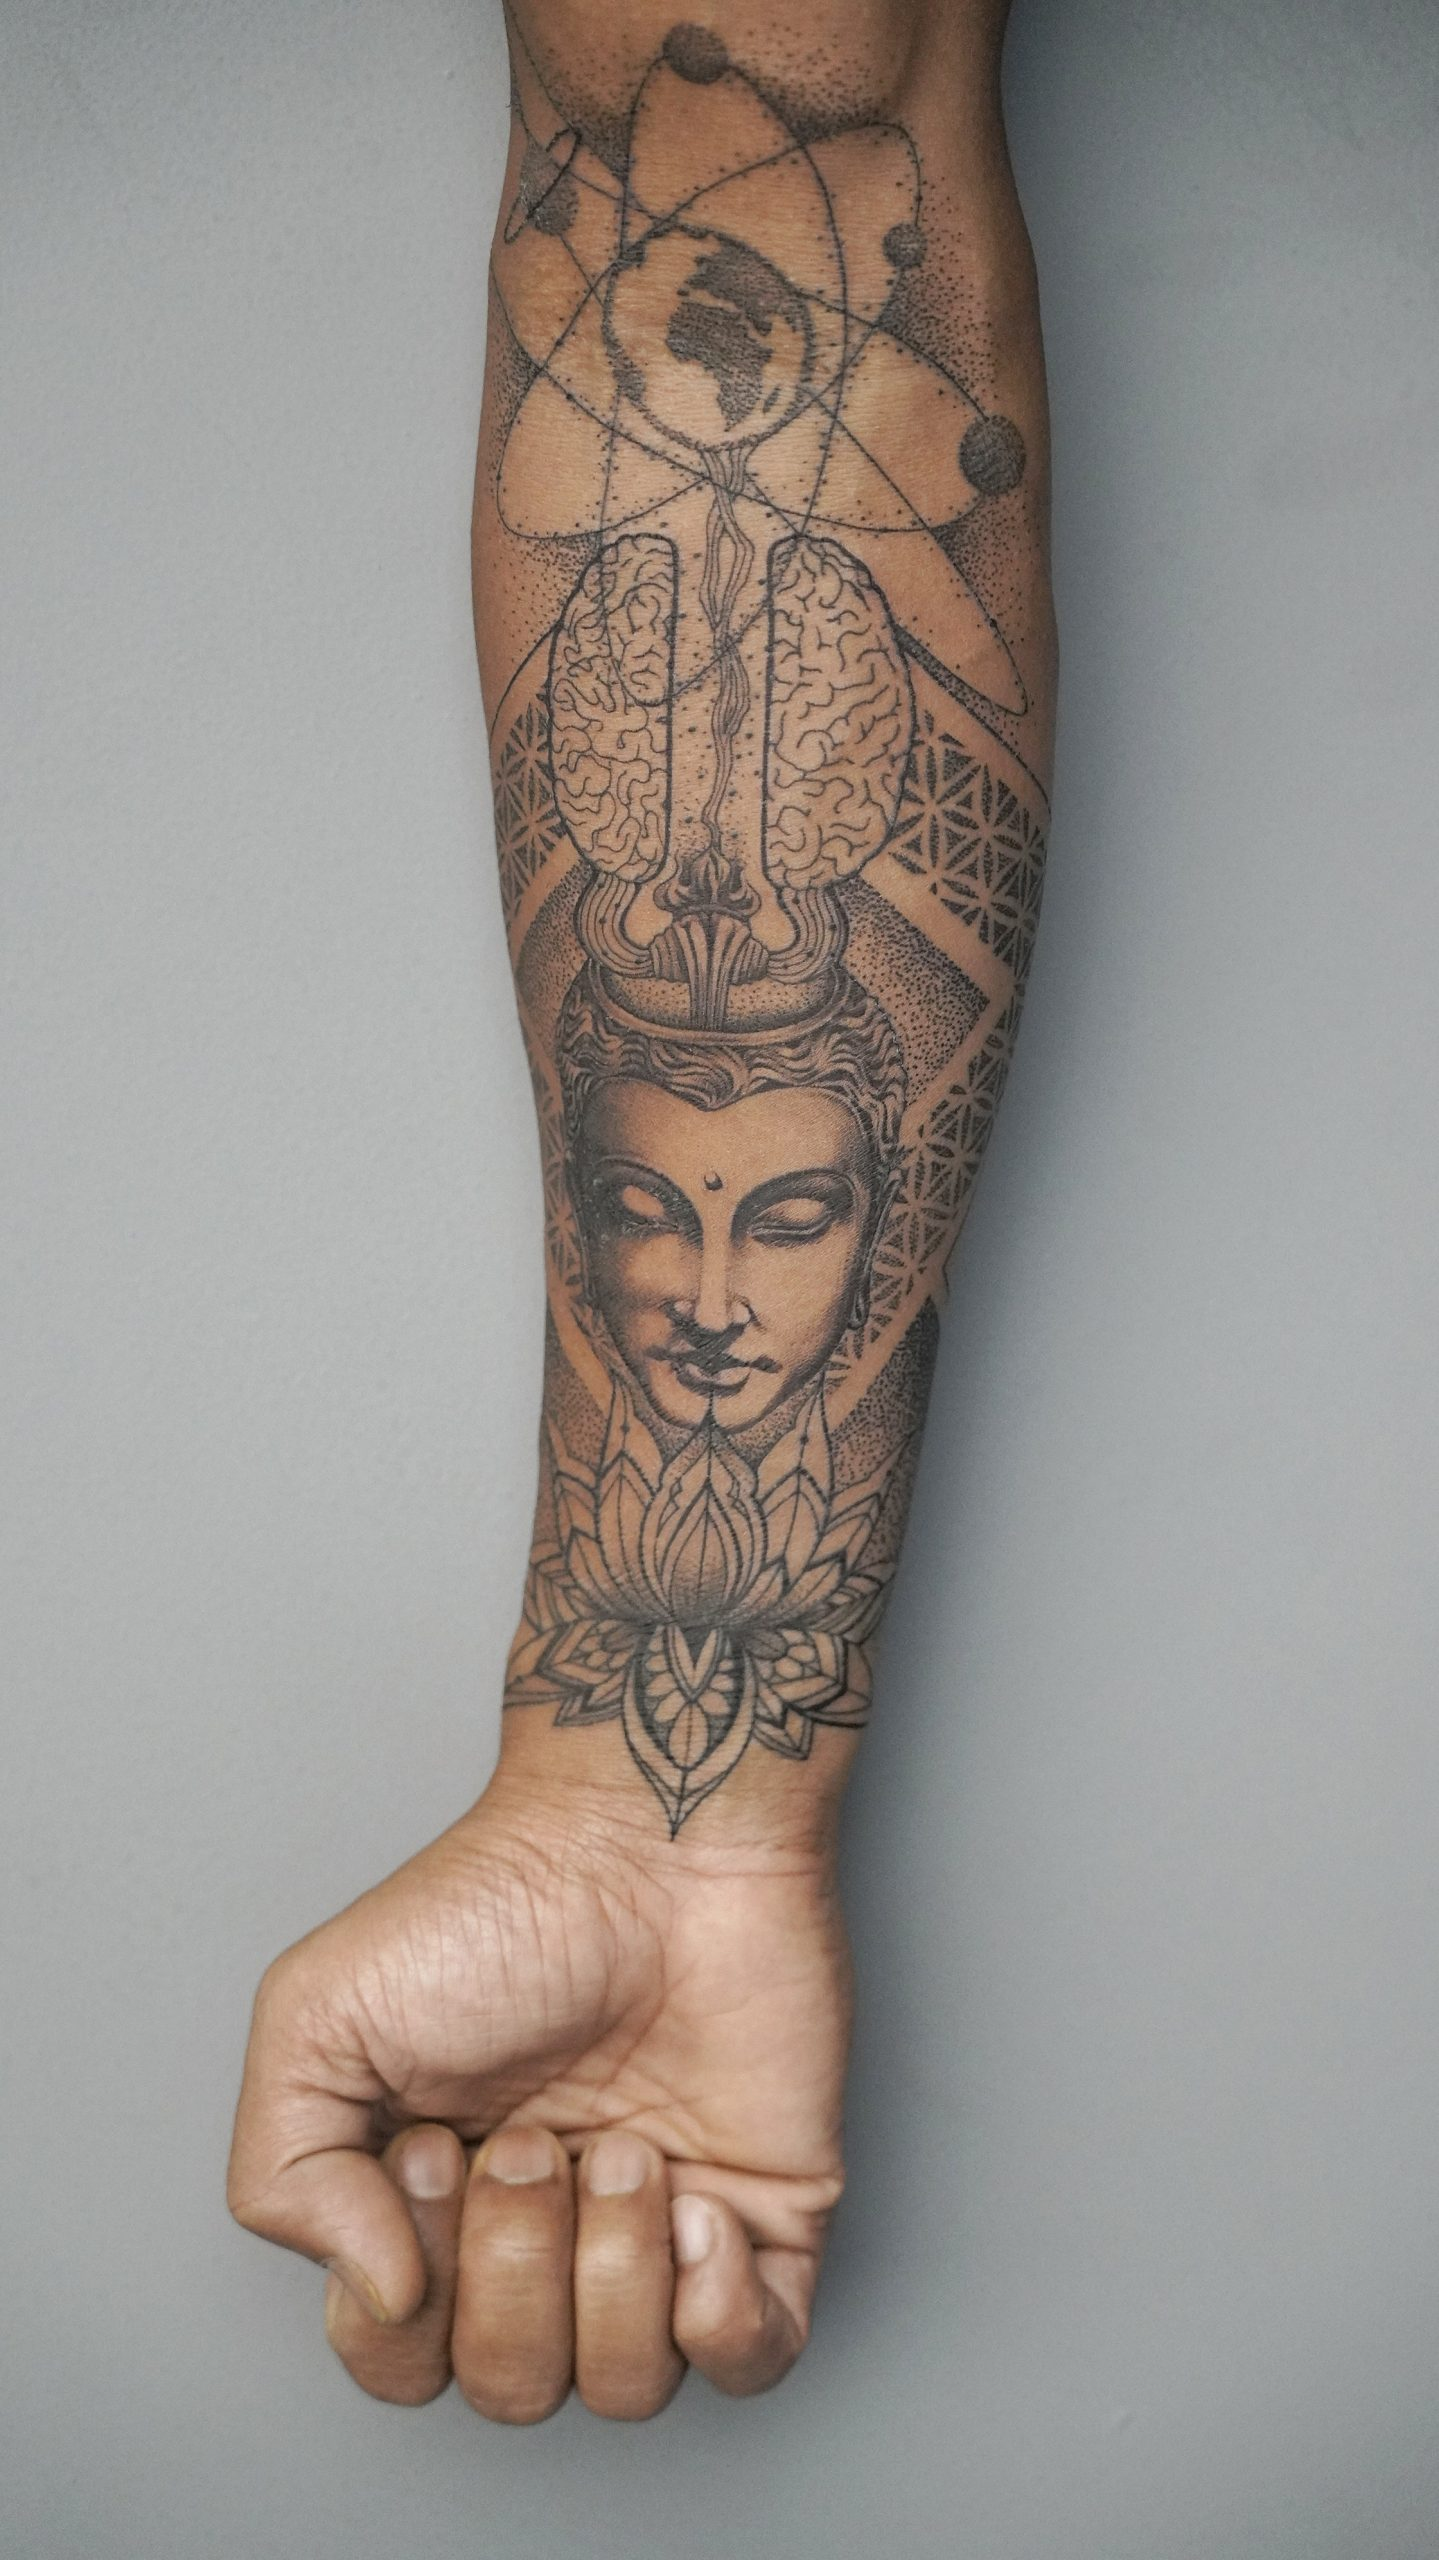 Tattoo made on wrist